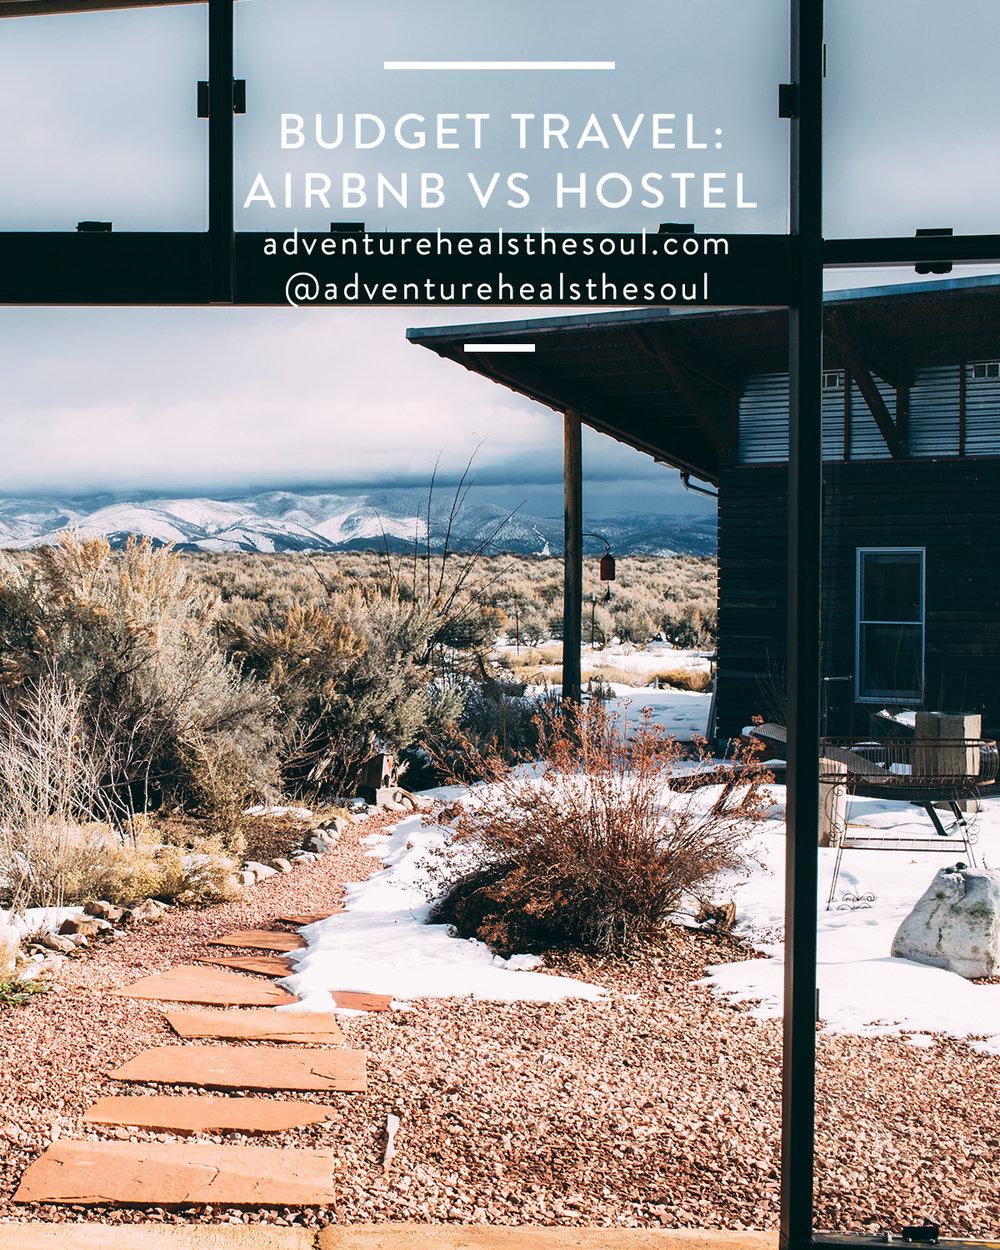 Budget Travel: Airbnb vs Hostel